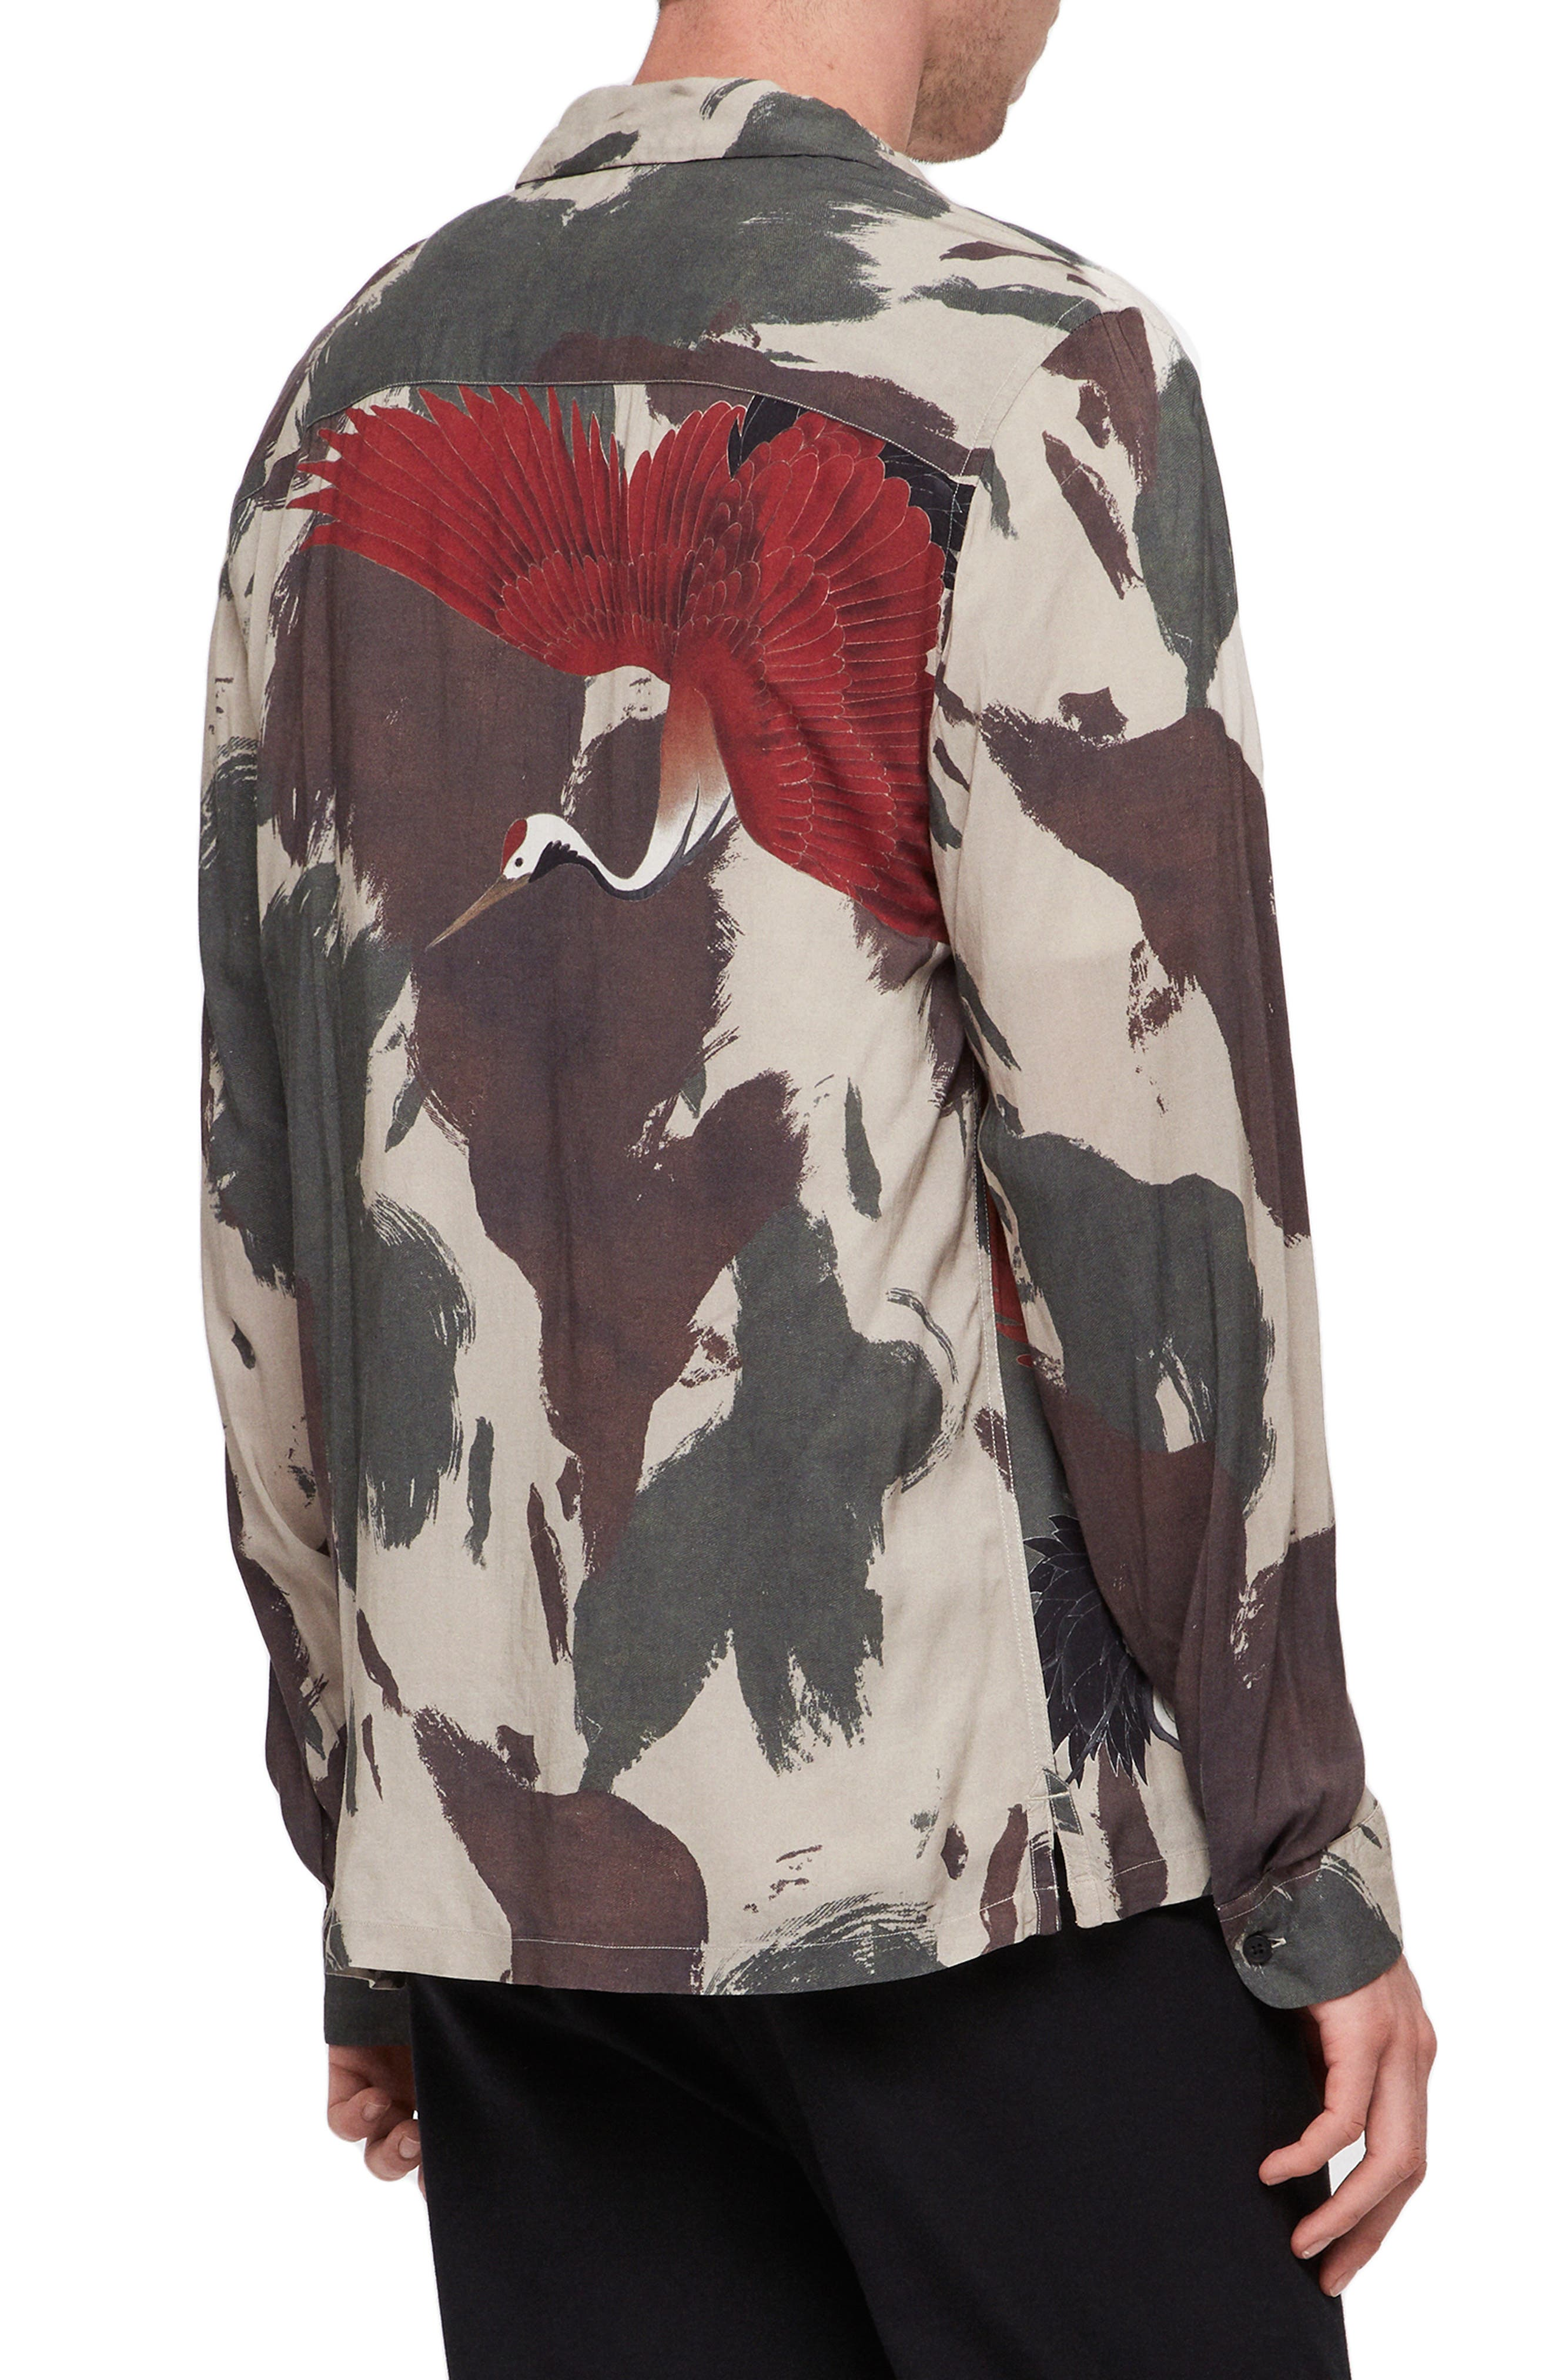 Lucerne Slim Fit Shirt,                             Alternate thumbnail 3, color,                             300